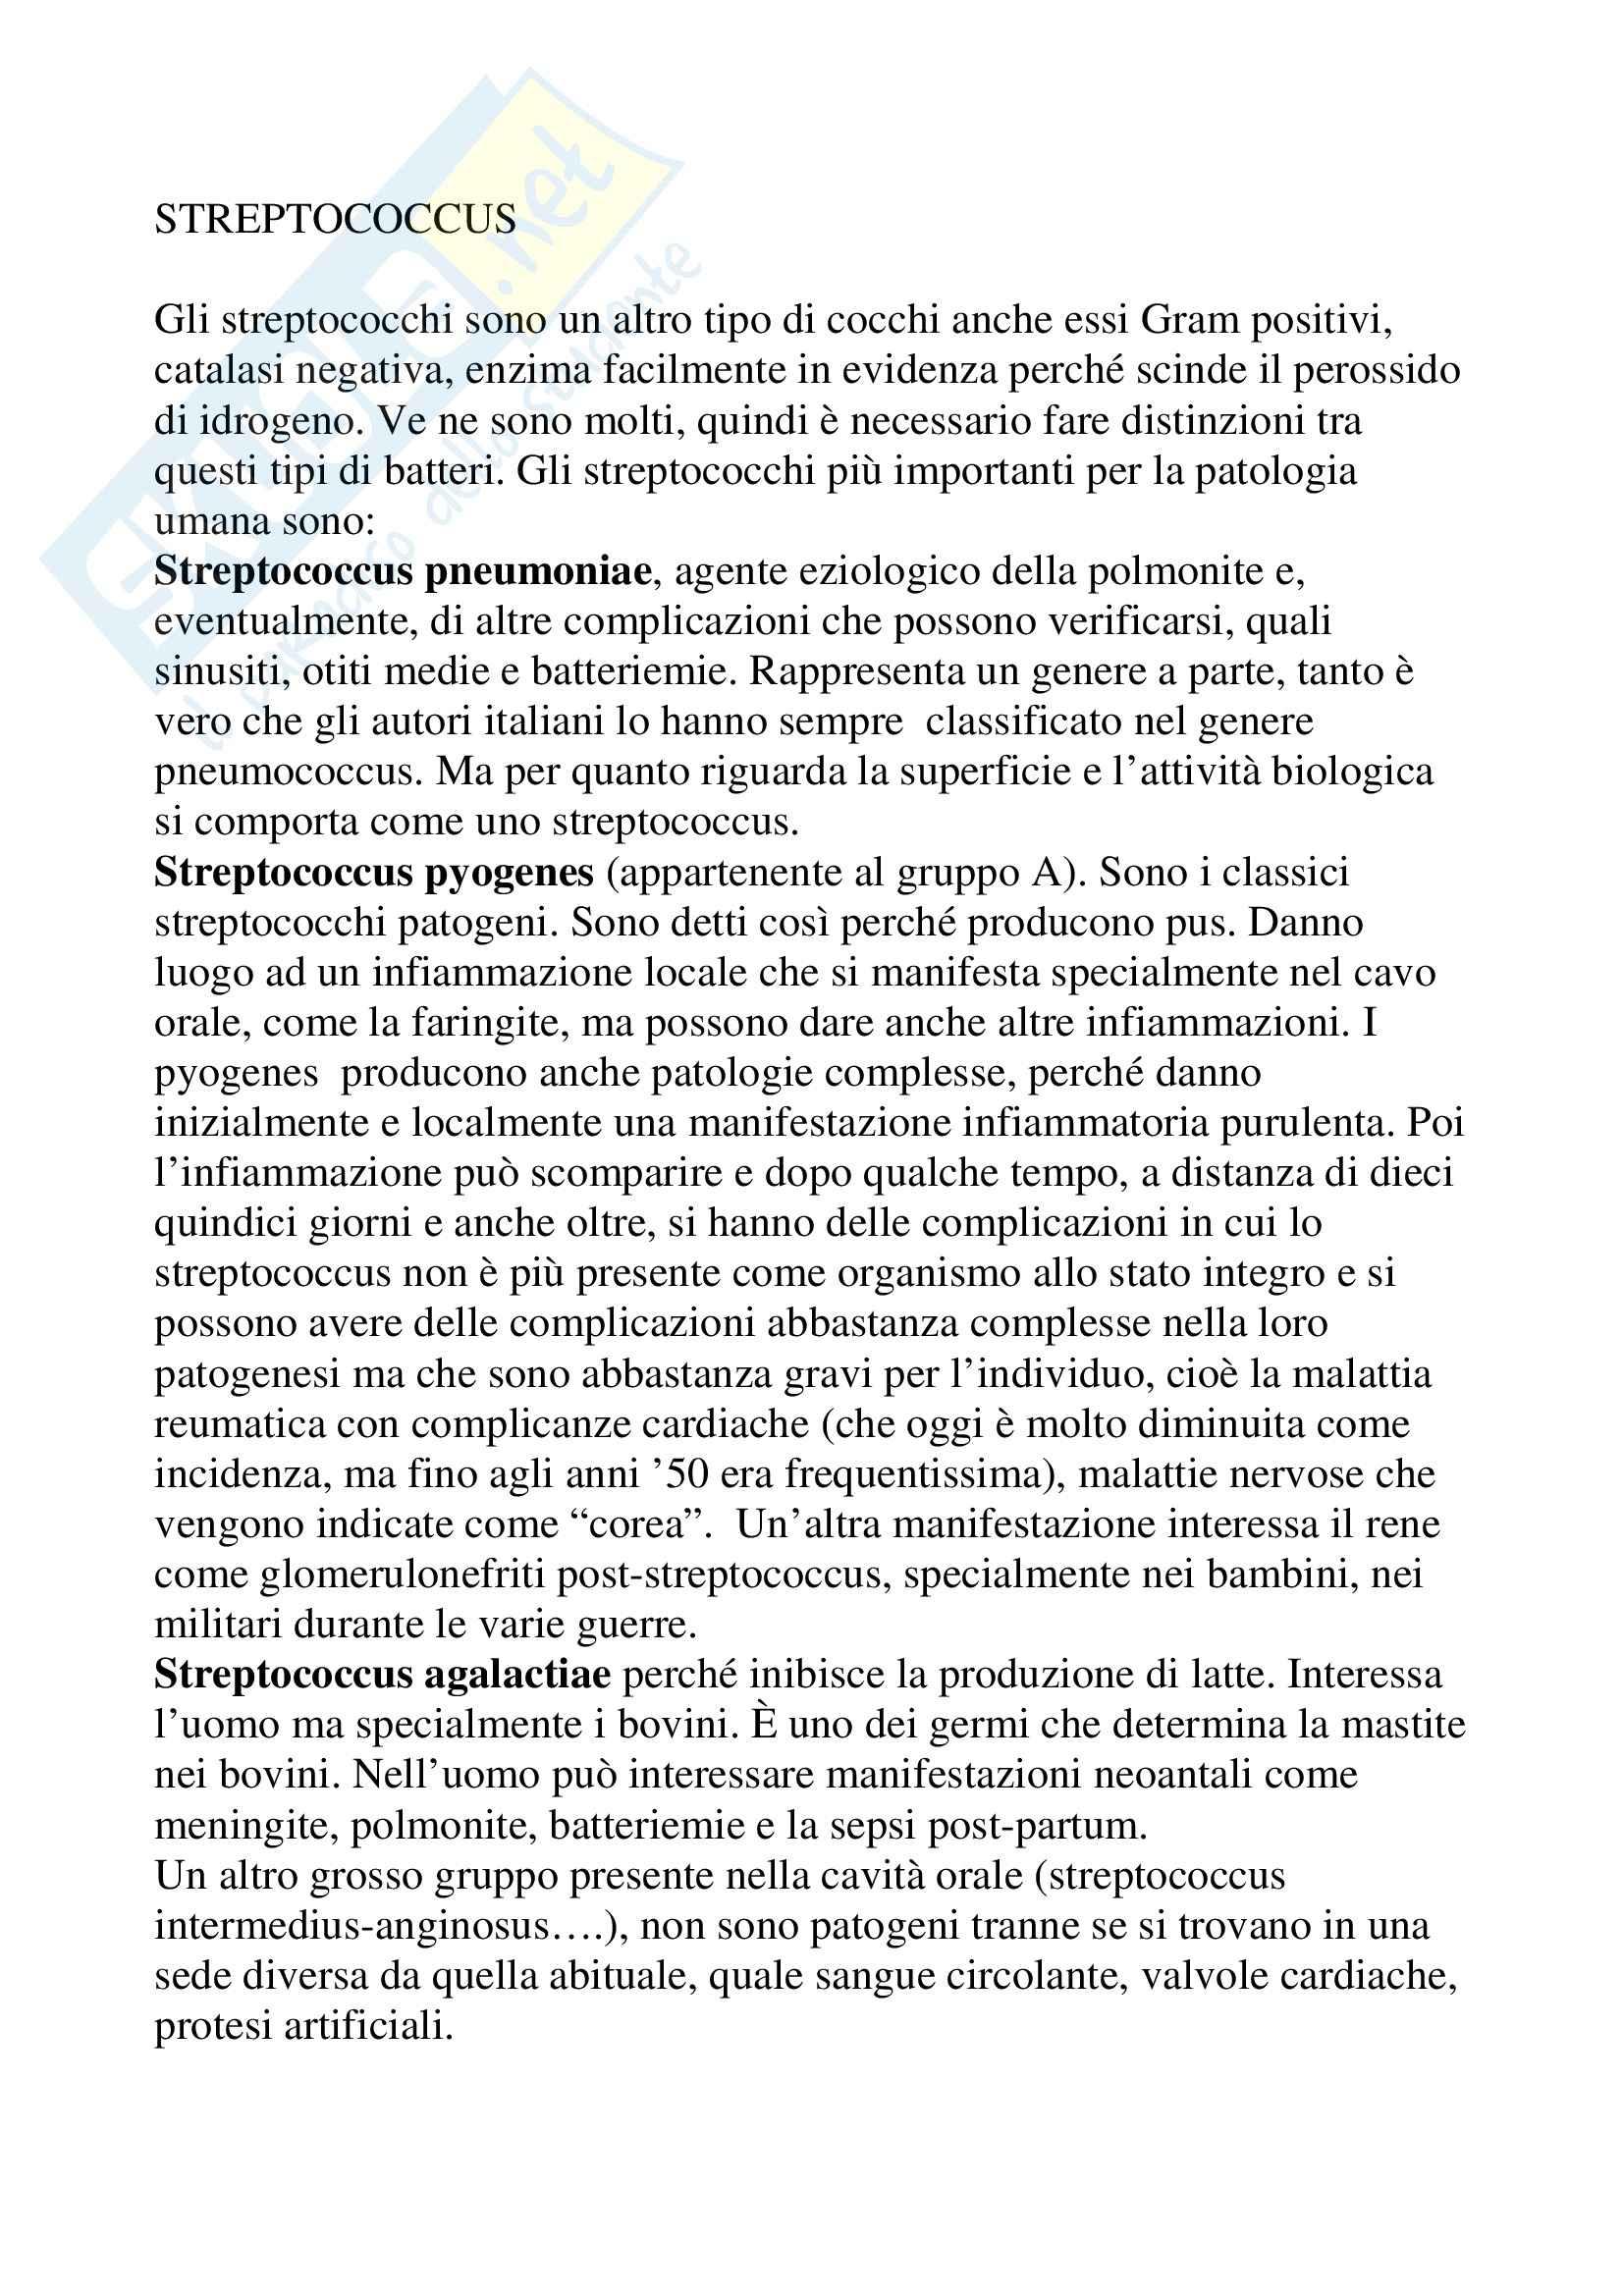 Microbiologia - streptococchi